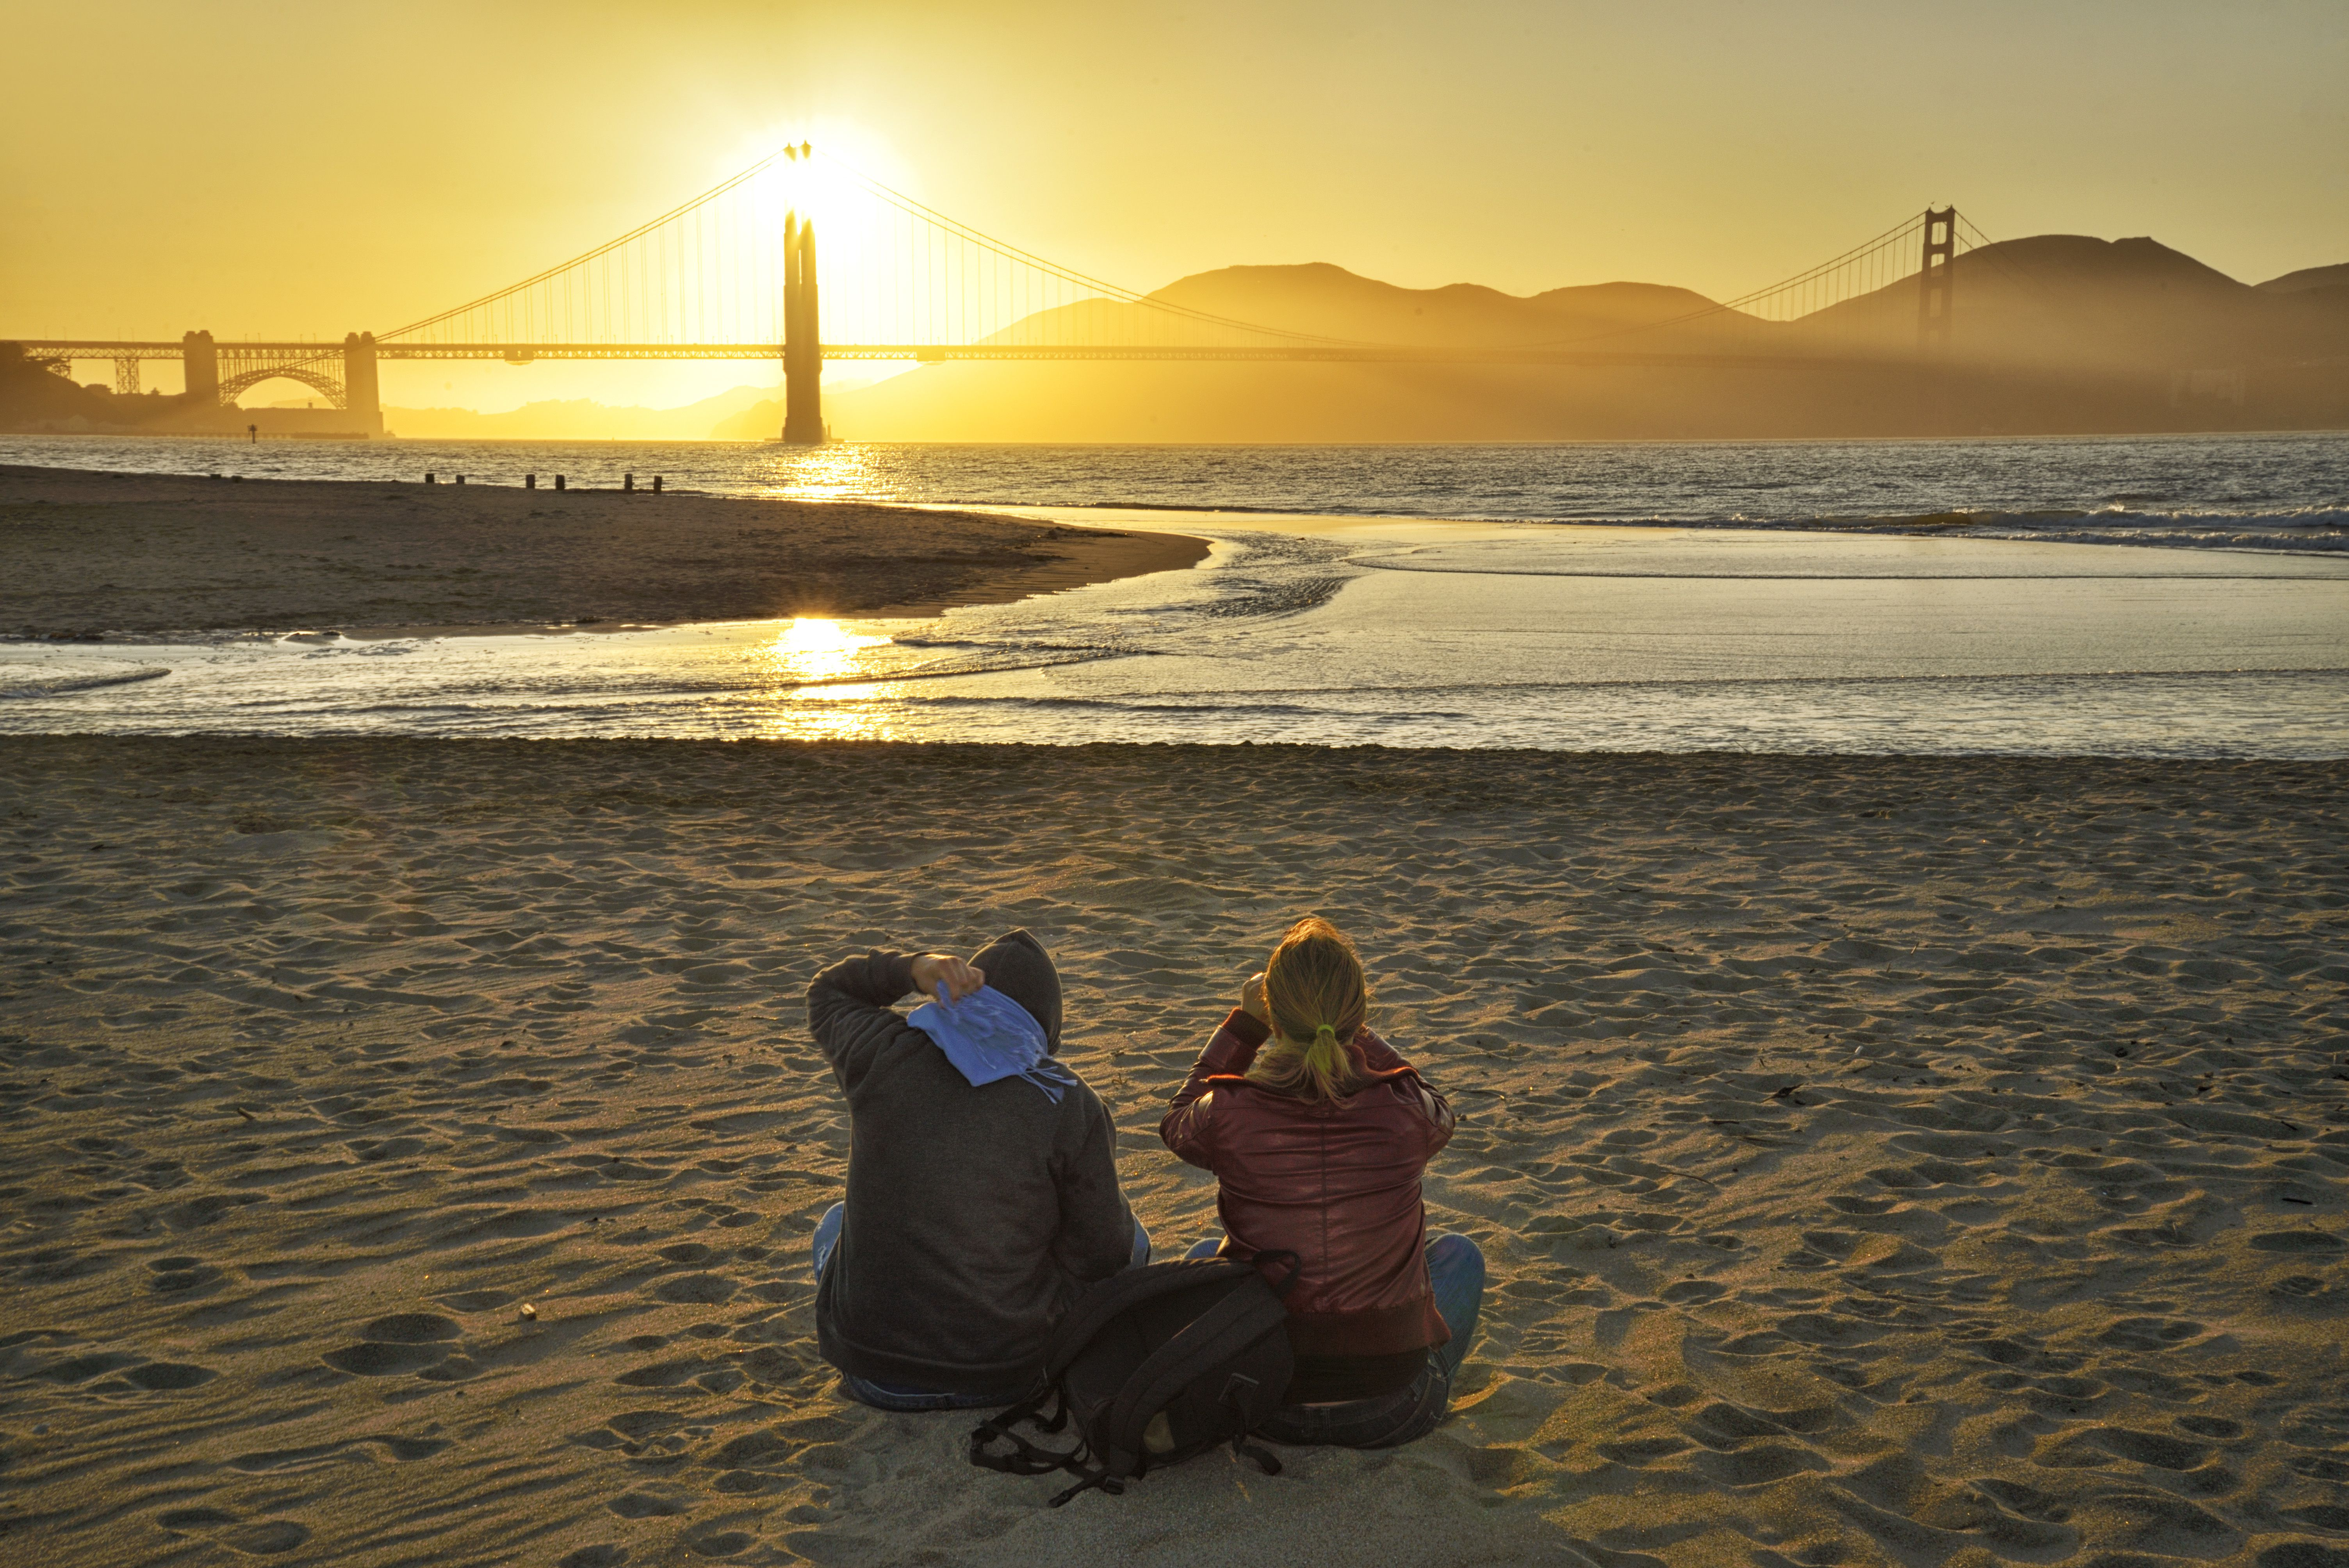 People sitting on sand at sunset beyond Golden Gate Bridge